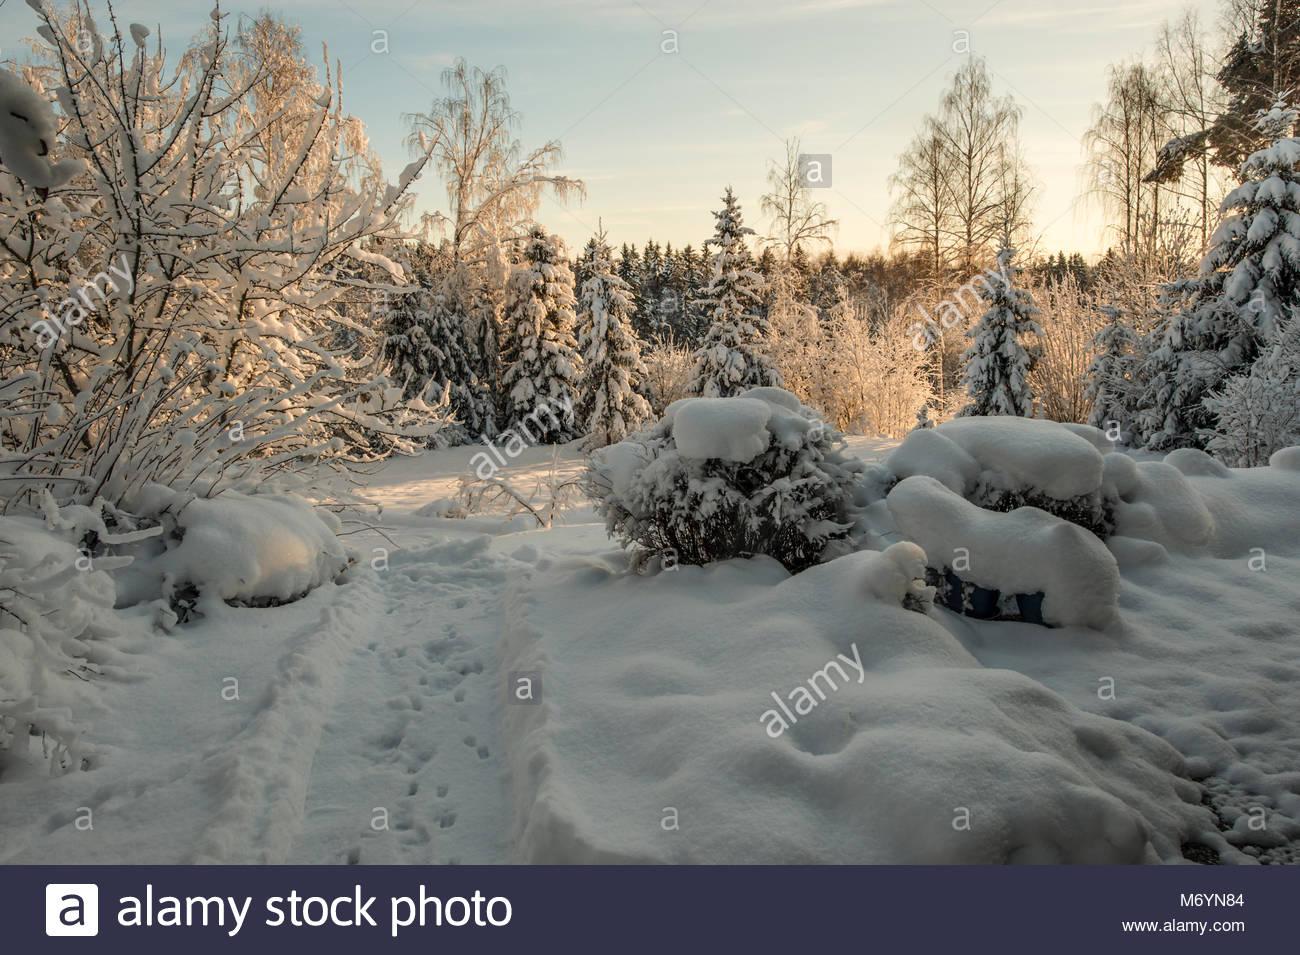 Winter wonderland in Roslagen, Sweden. Designer garden in winter in Sweden. Very heavy snow on the trees. - Stock Image